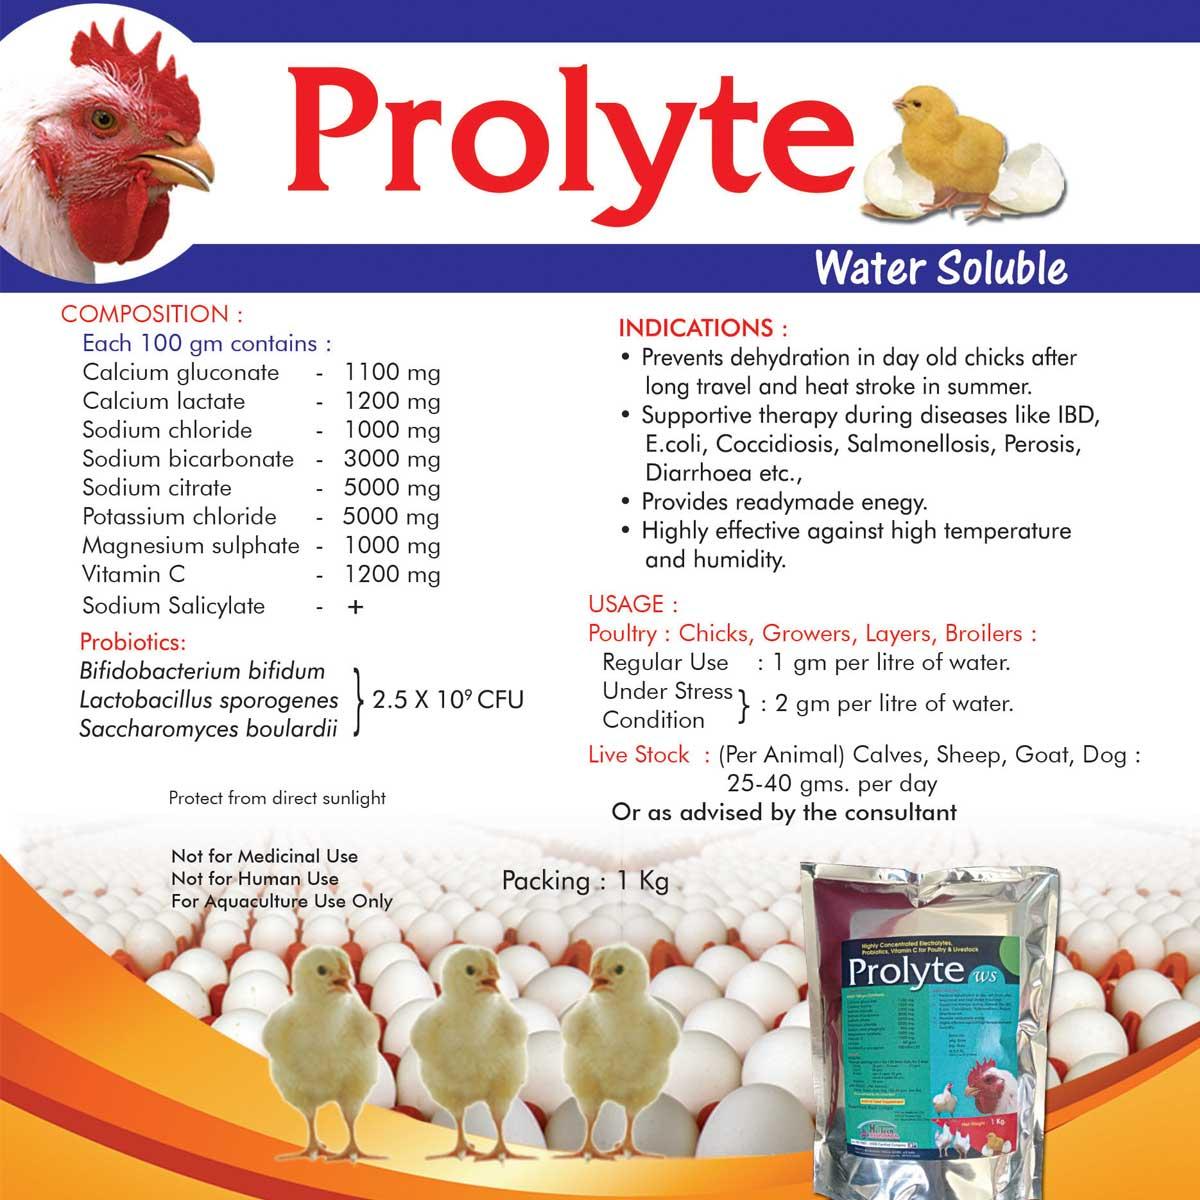 Prolyte Water Soluble - Hi-Tech Pharma